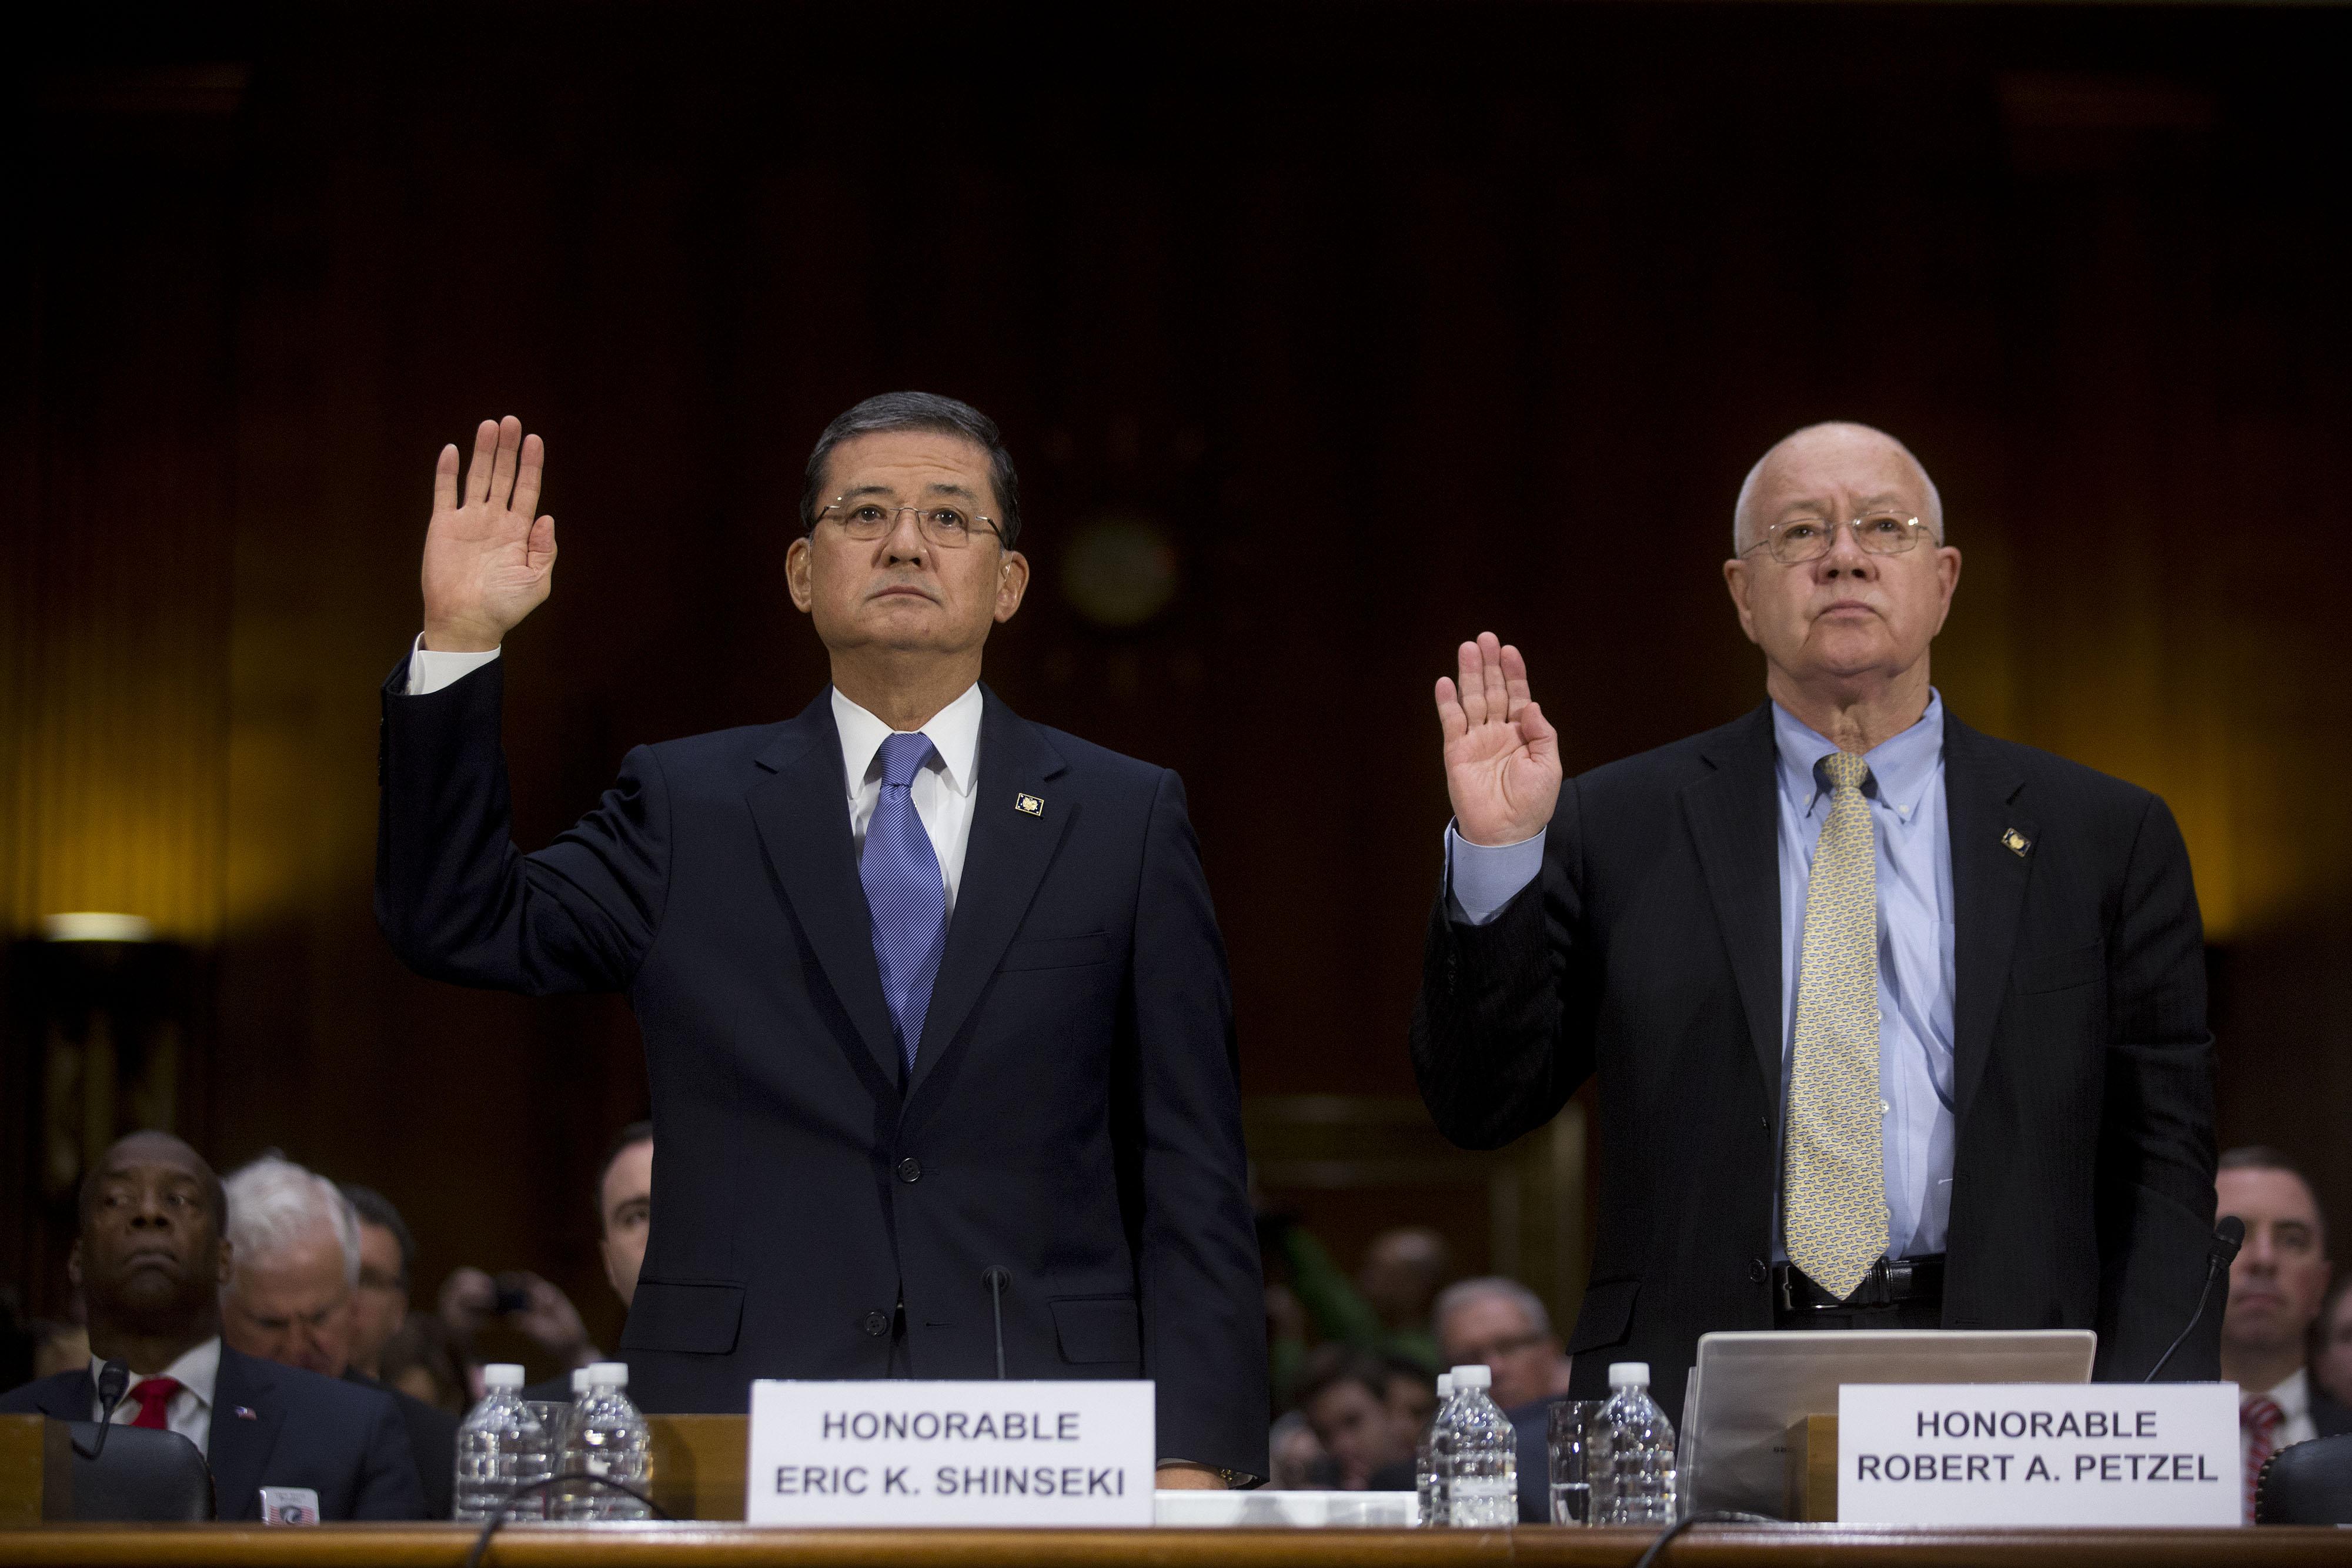 Eric Shinseki, U.S. secretary of Veterans Affairs (VA), left, and Robert Petzel, U.S. VA undersecretary for health, swear in to a Senate Veterans' Affairs Committee hearing in Washington, May 15, 2014.